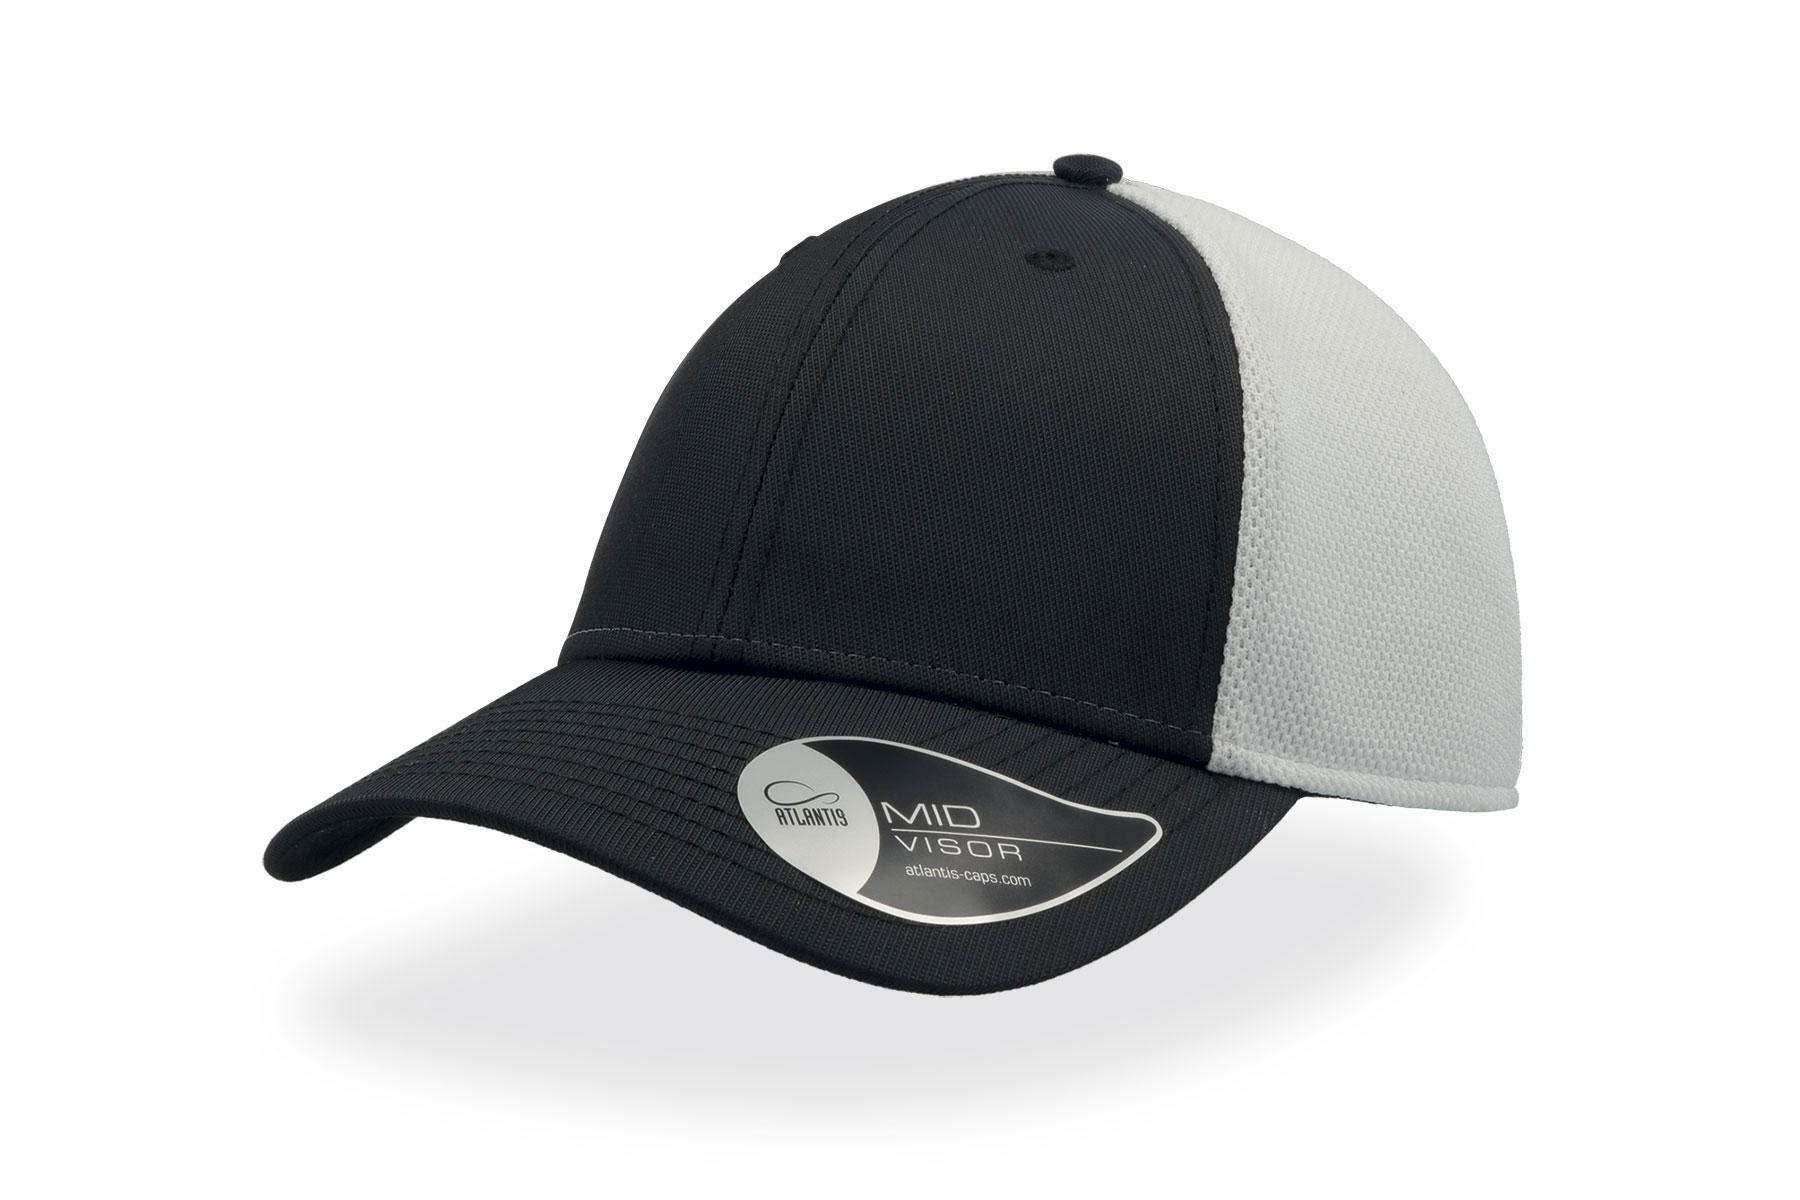 Campus verkkolippis - NEW 2019 ATLANTIS CAPS & HATS - CAMC - 2